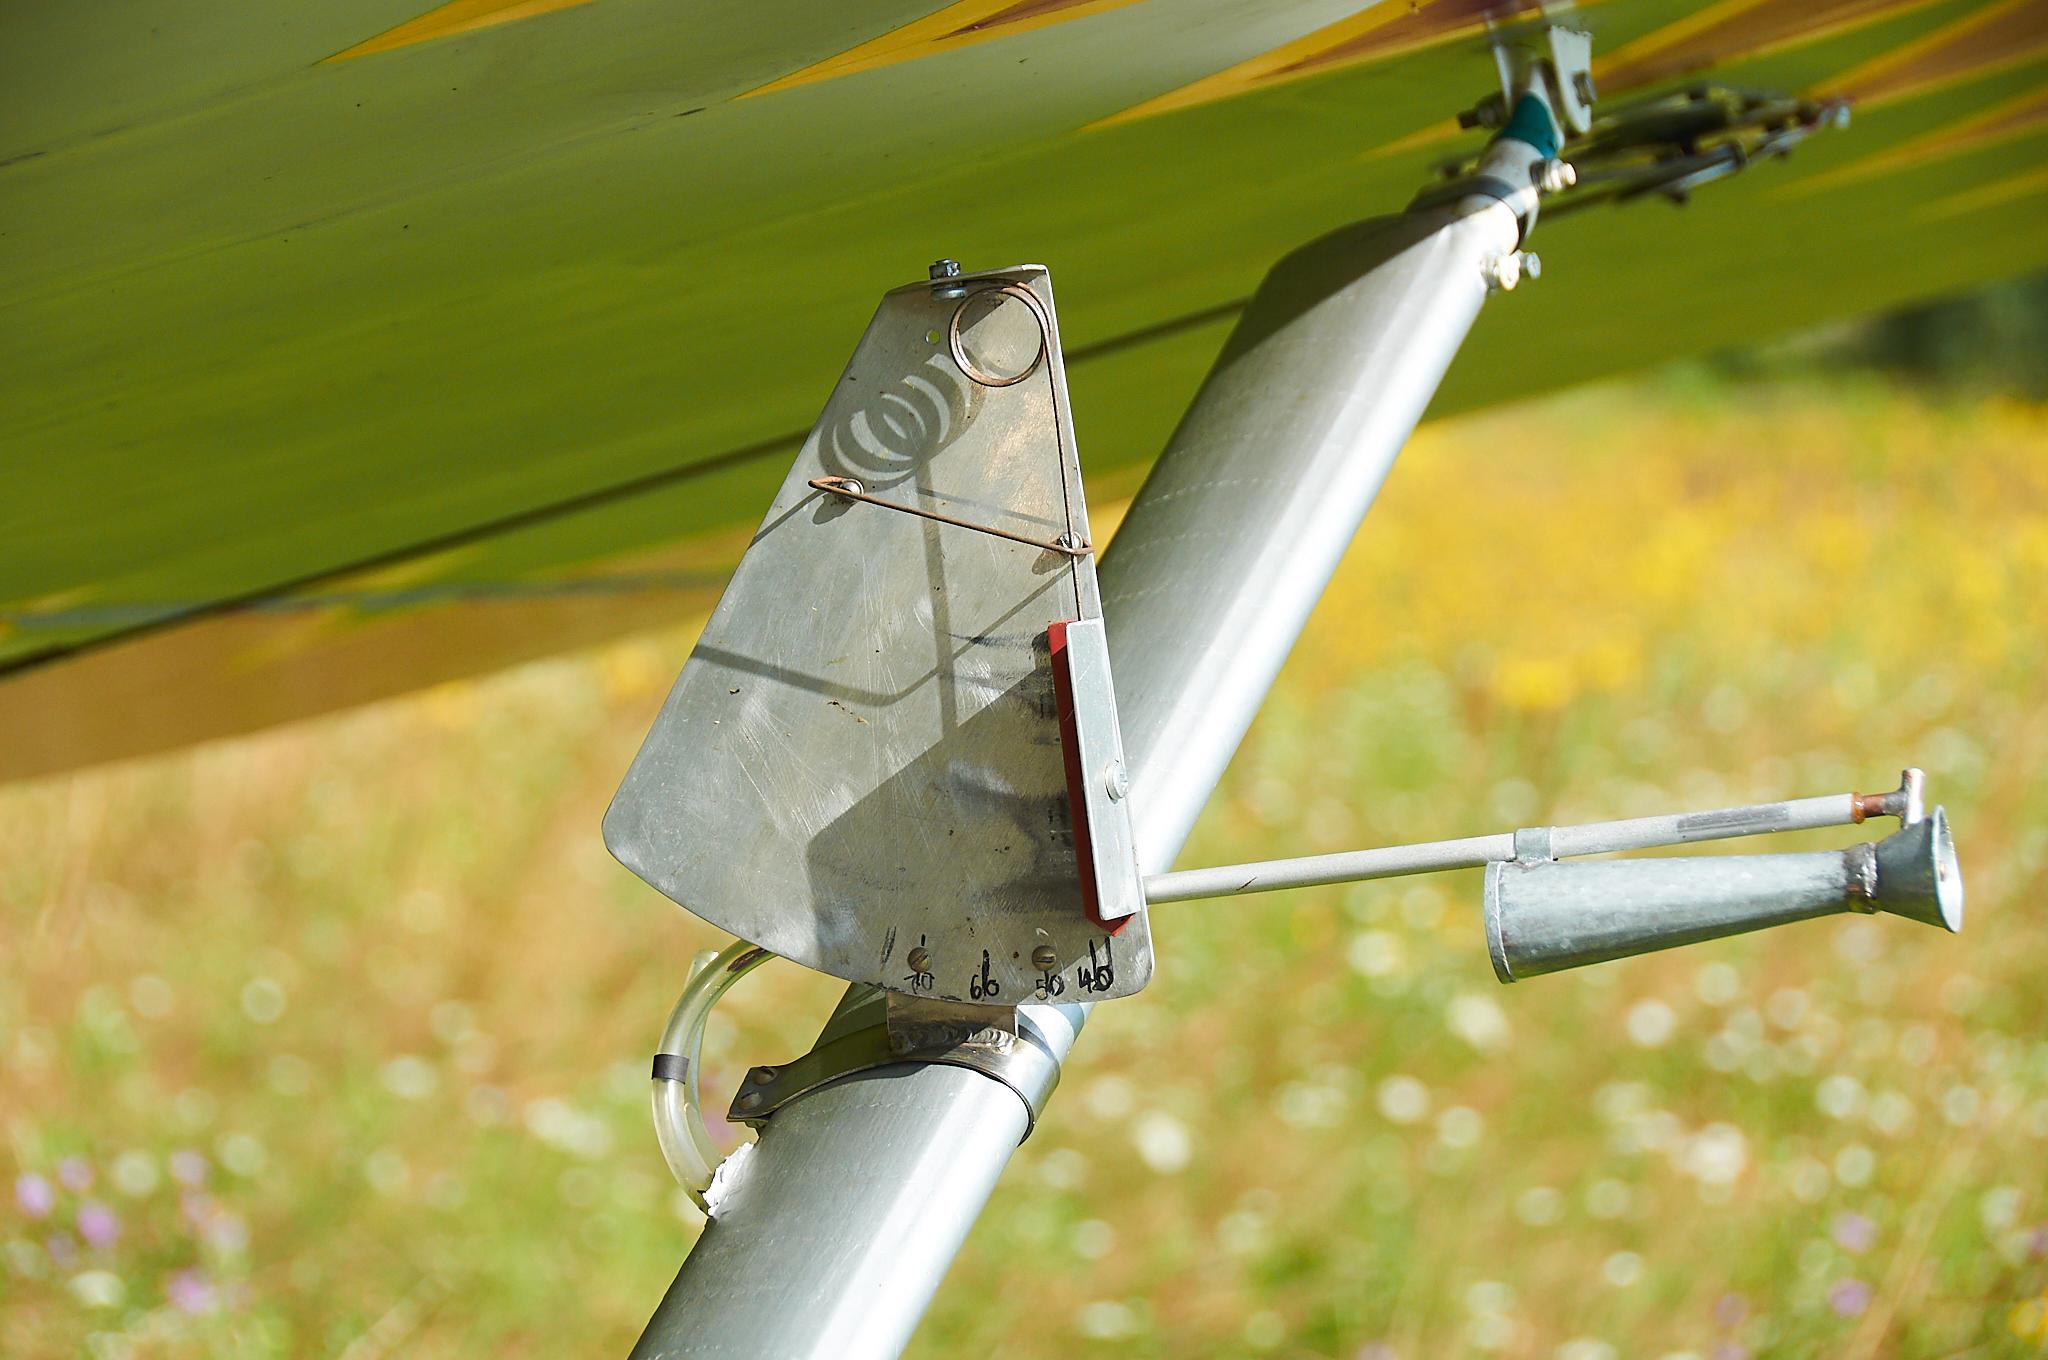 Anyone can build an airplane - Cамолёт может построить каждый